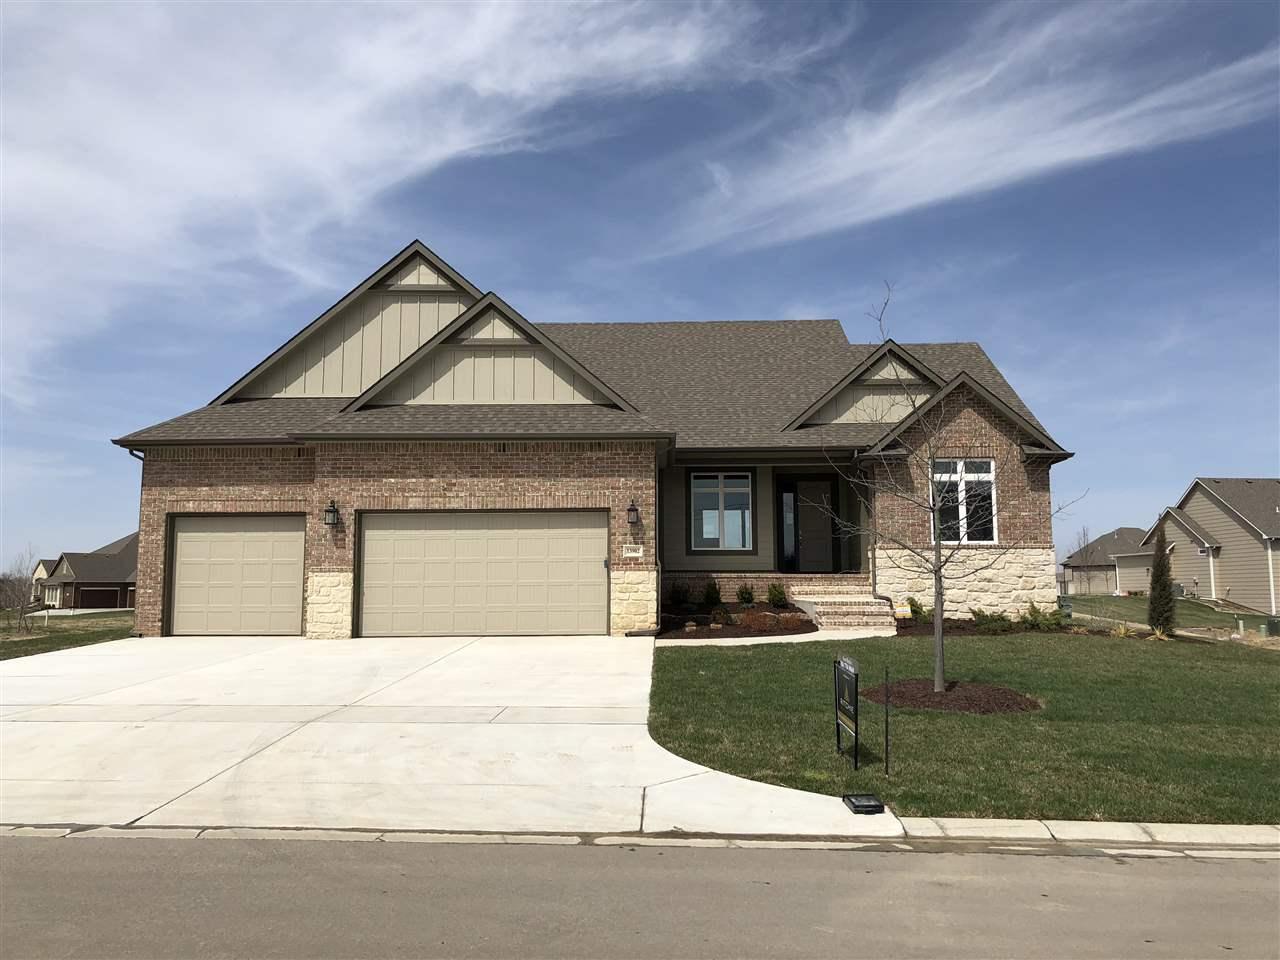 13902 E Steeple Chase Cir., Wichita, KS 67230